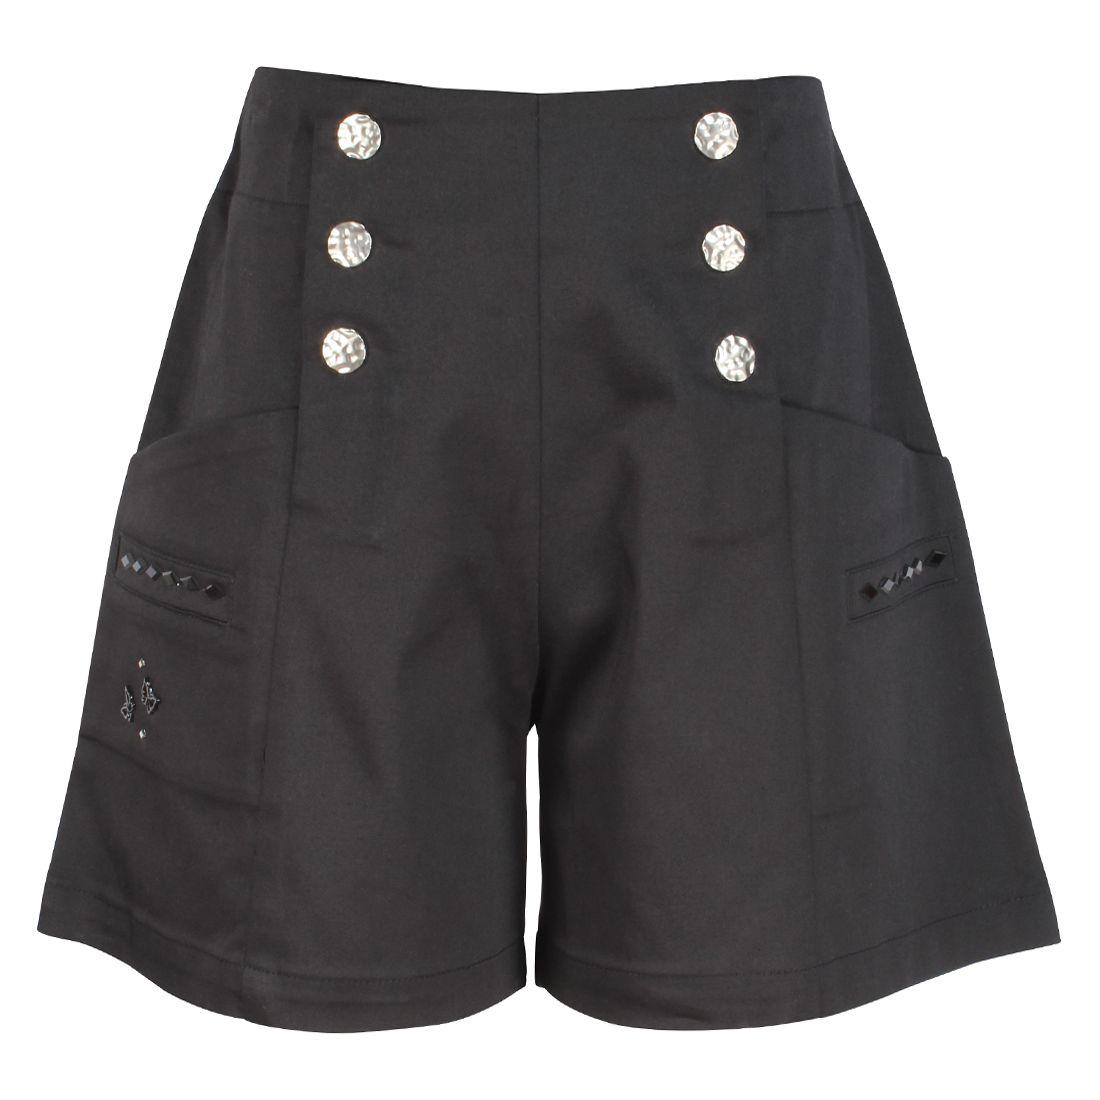 Cutecumber Girls Partywear Cotton Twill Shorts